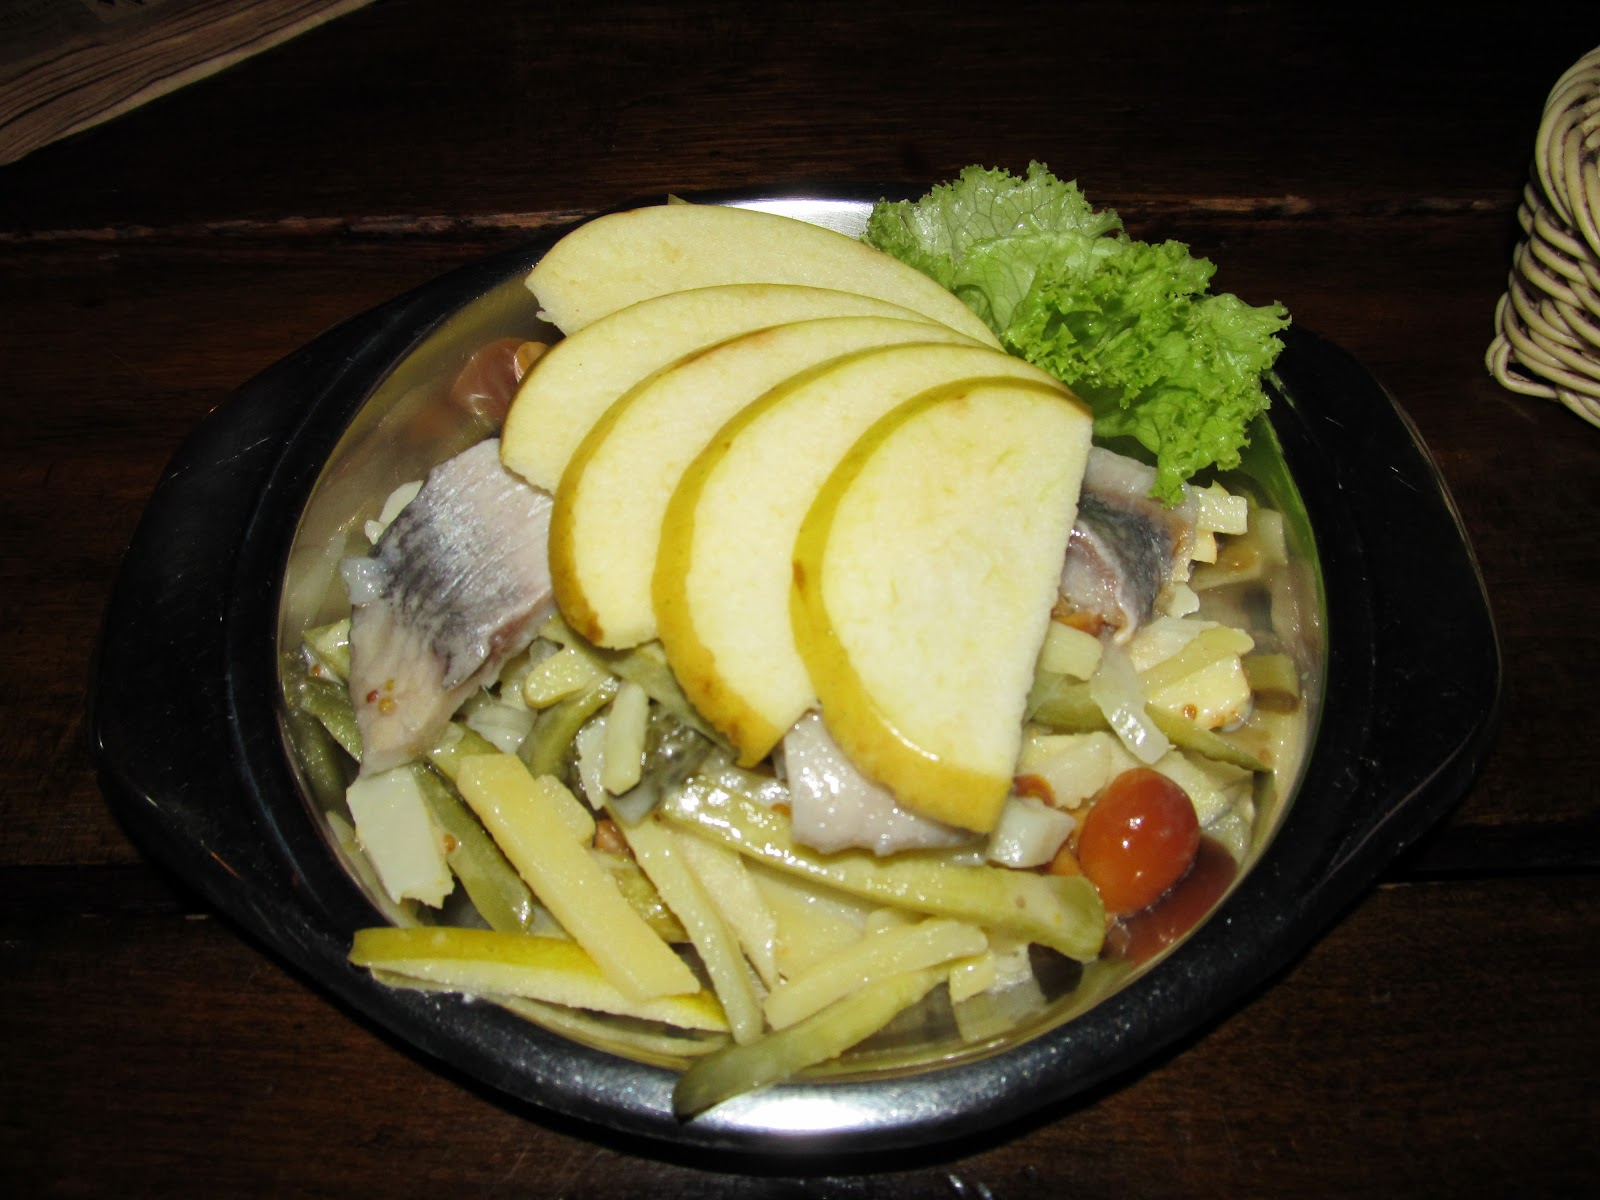 салат Магдебурка з ябком та оселедцем